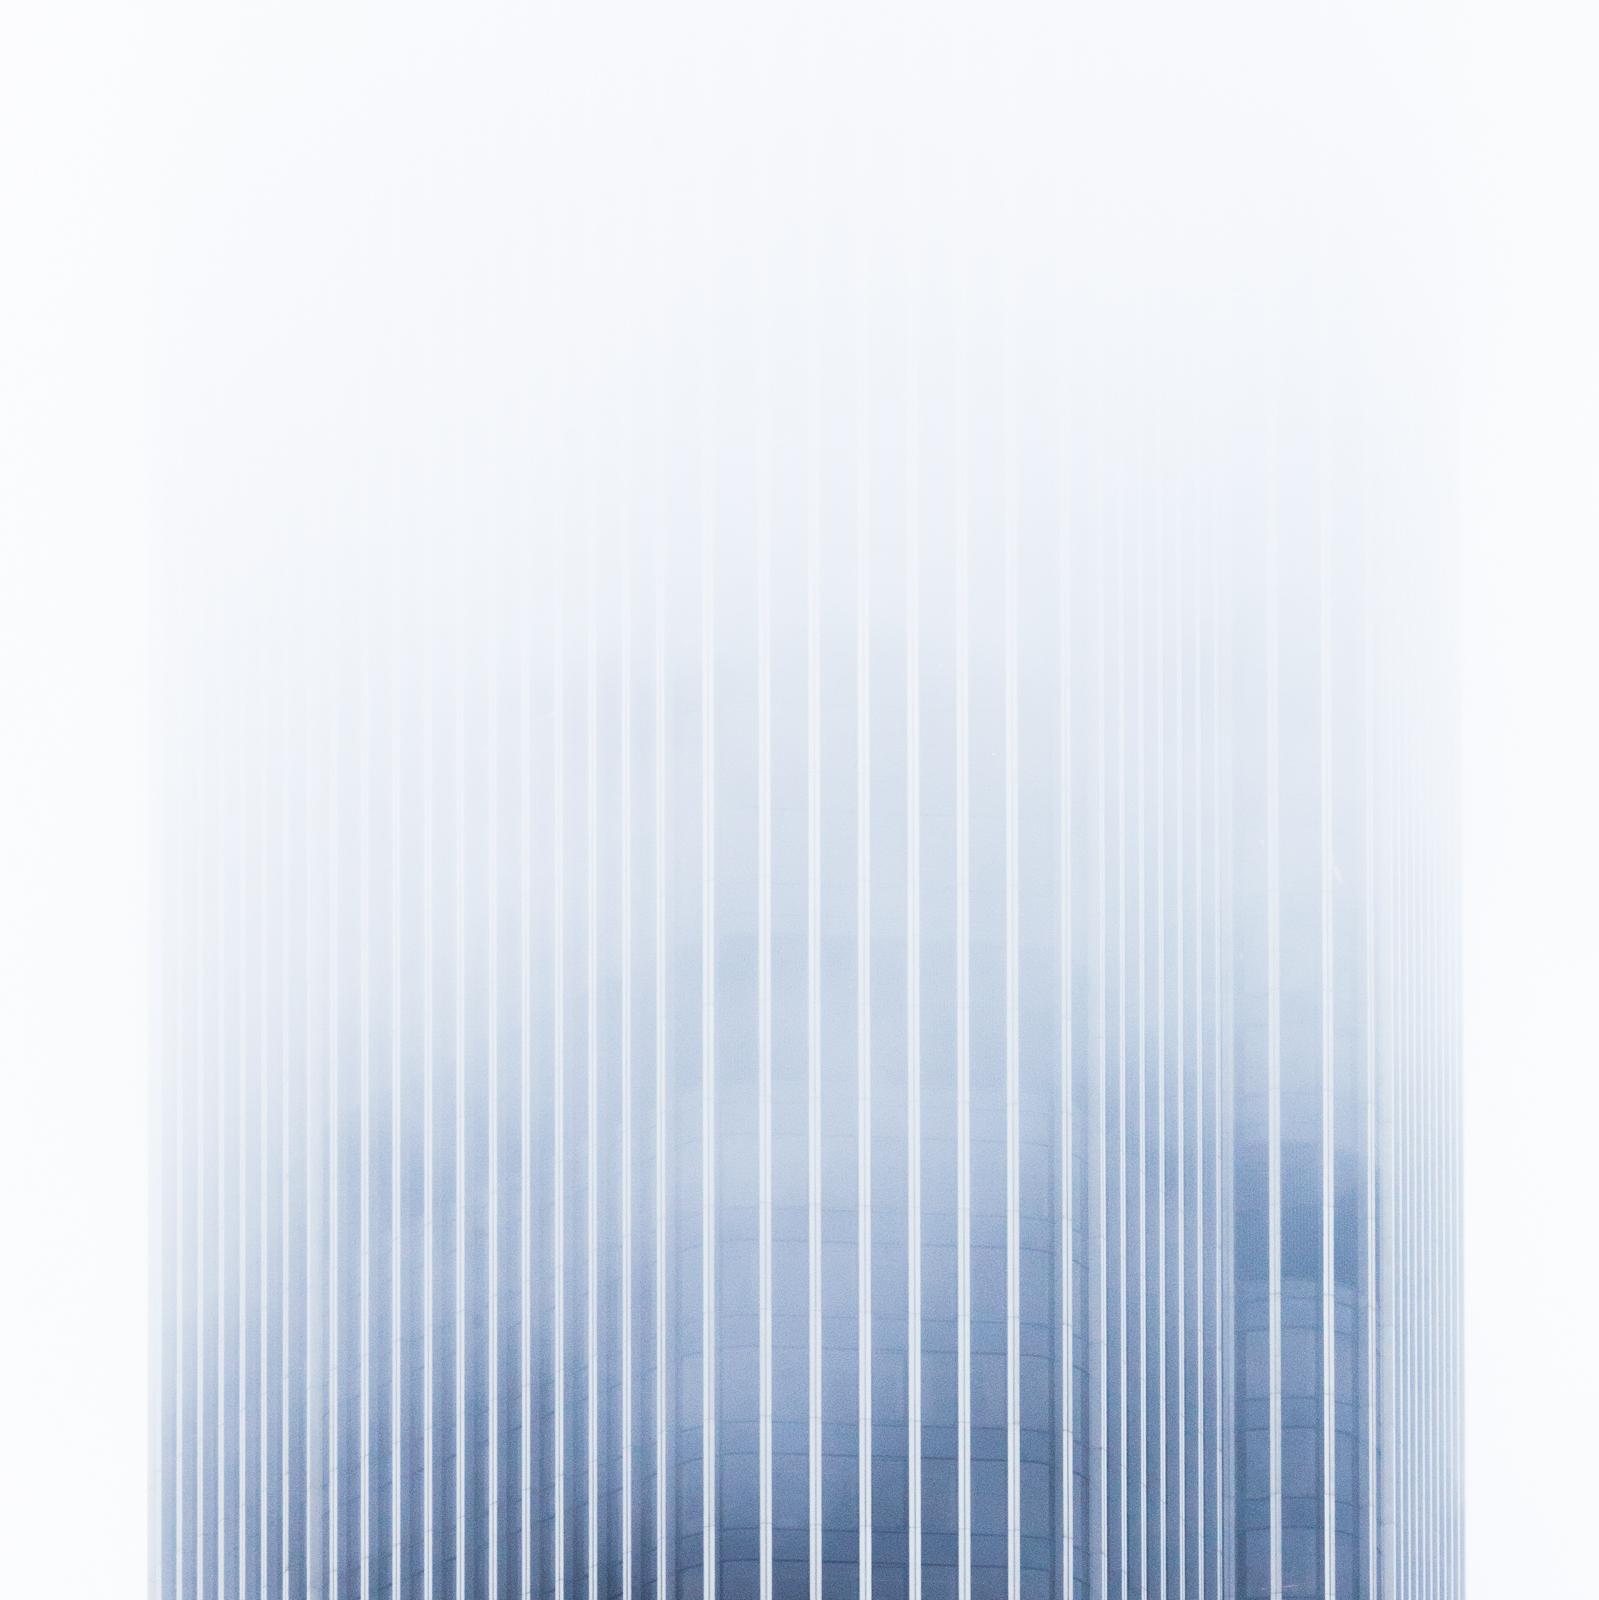 03@2x.jpg